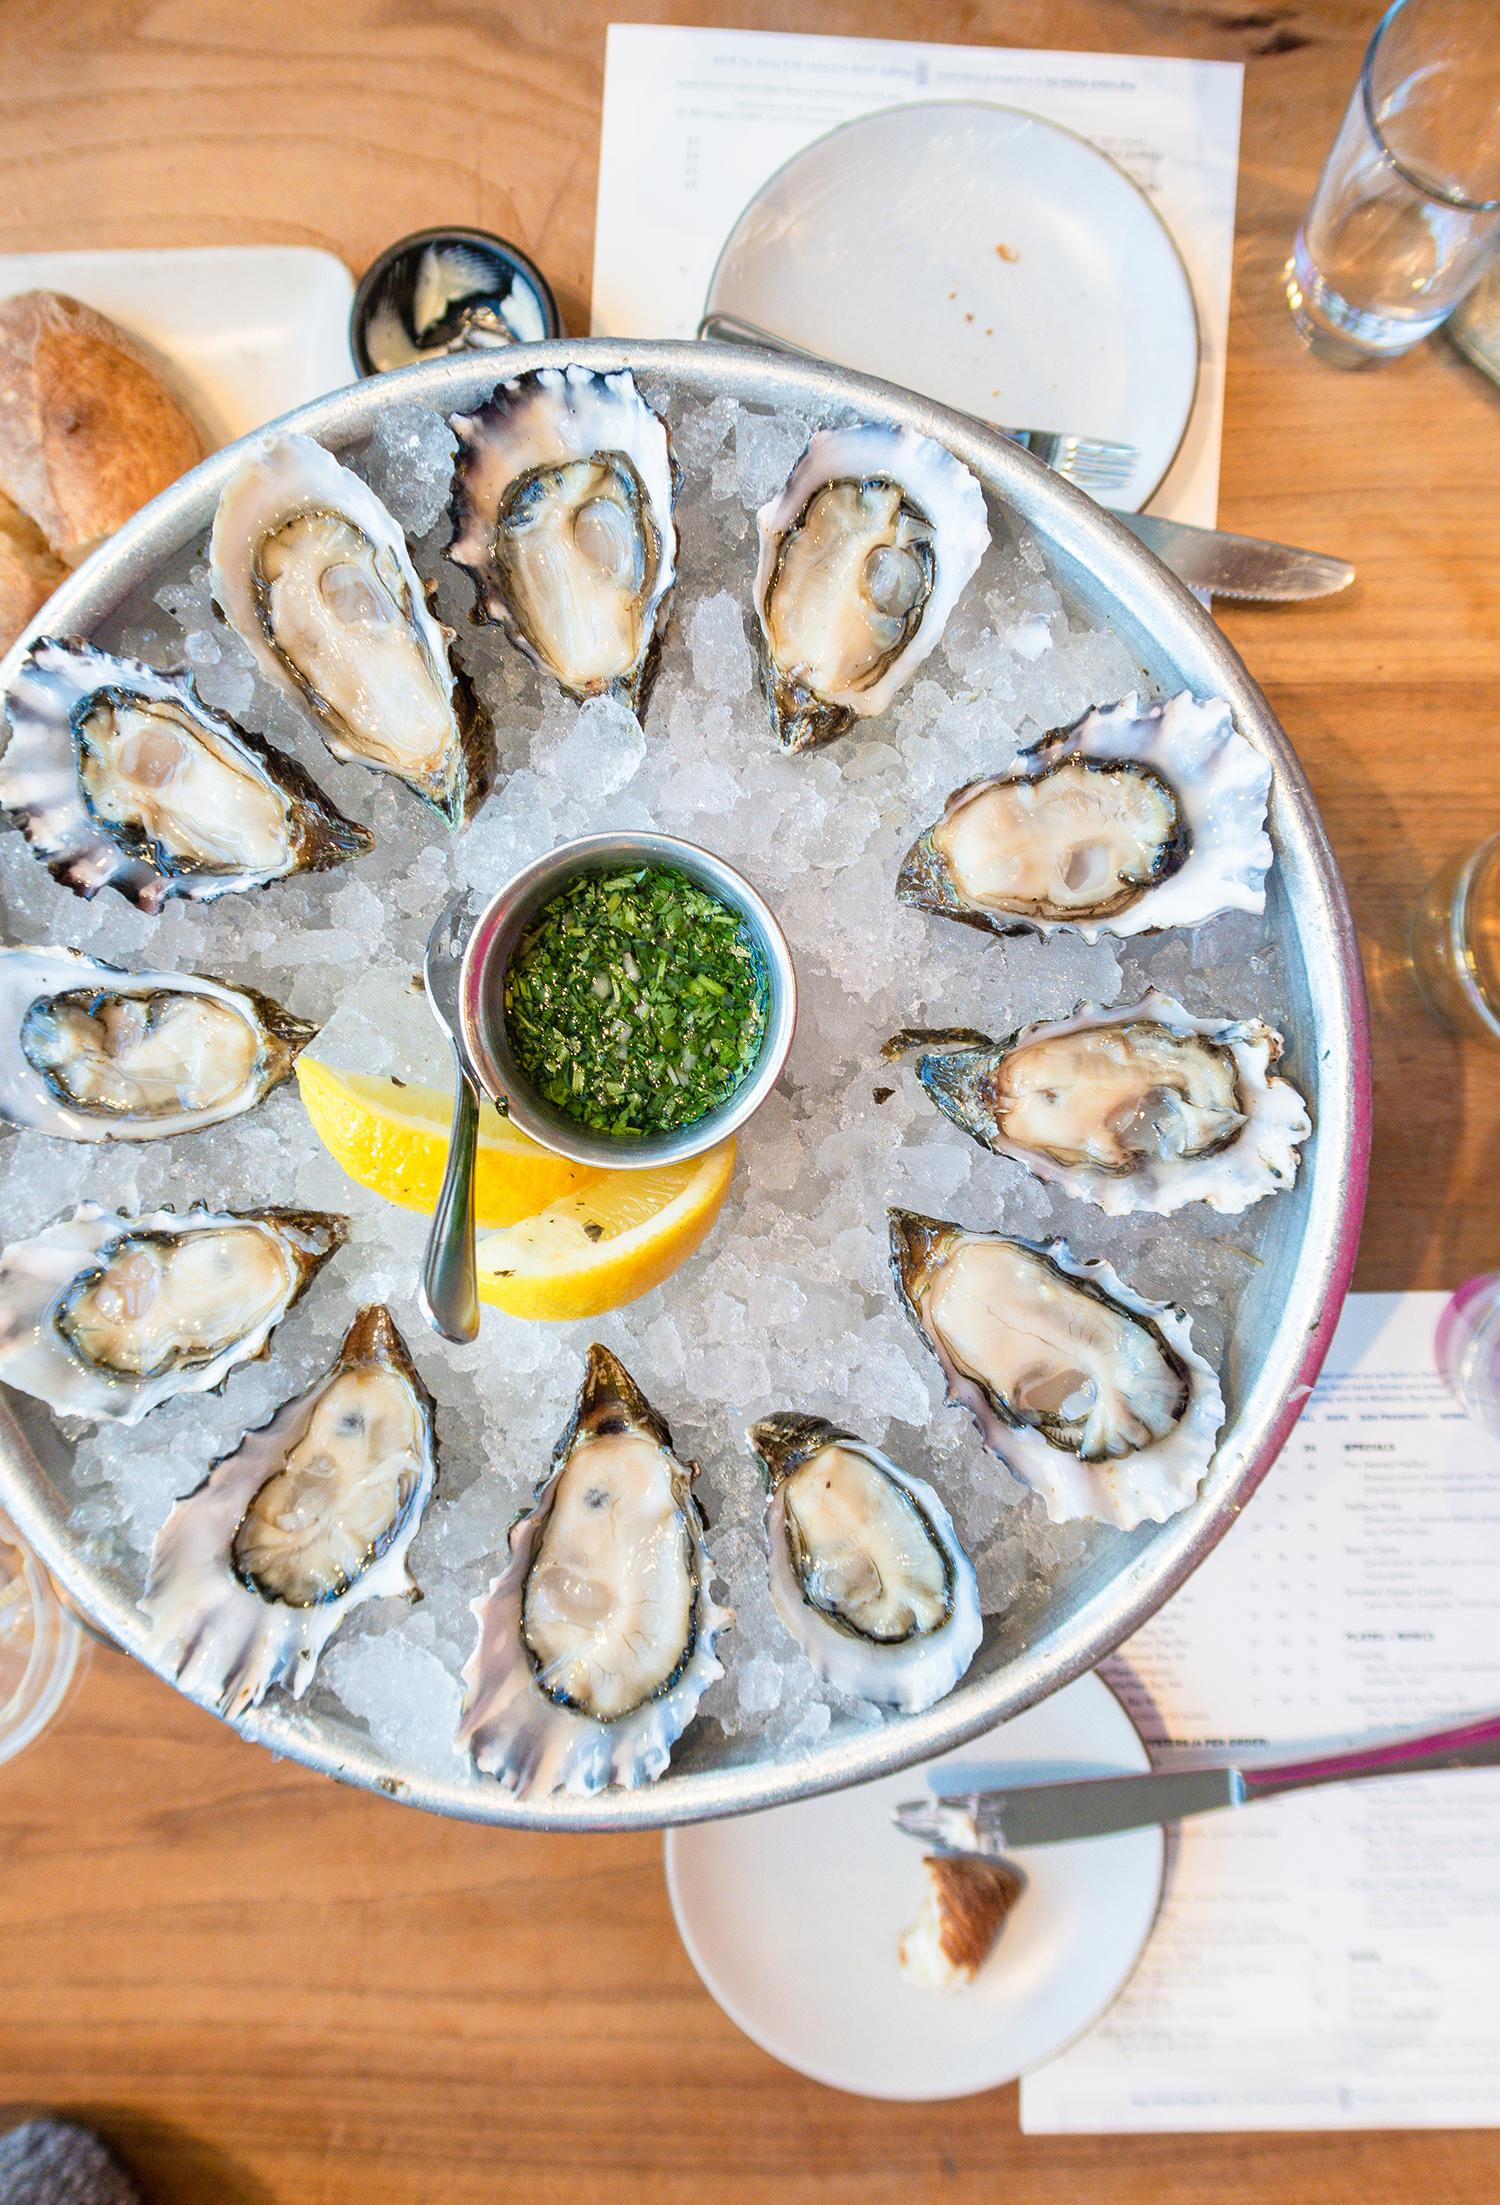 hog island oyster co oysters jmeyering creative - J.Meyering Creative